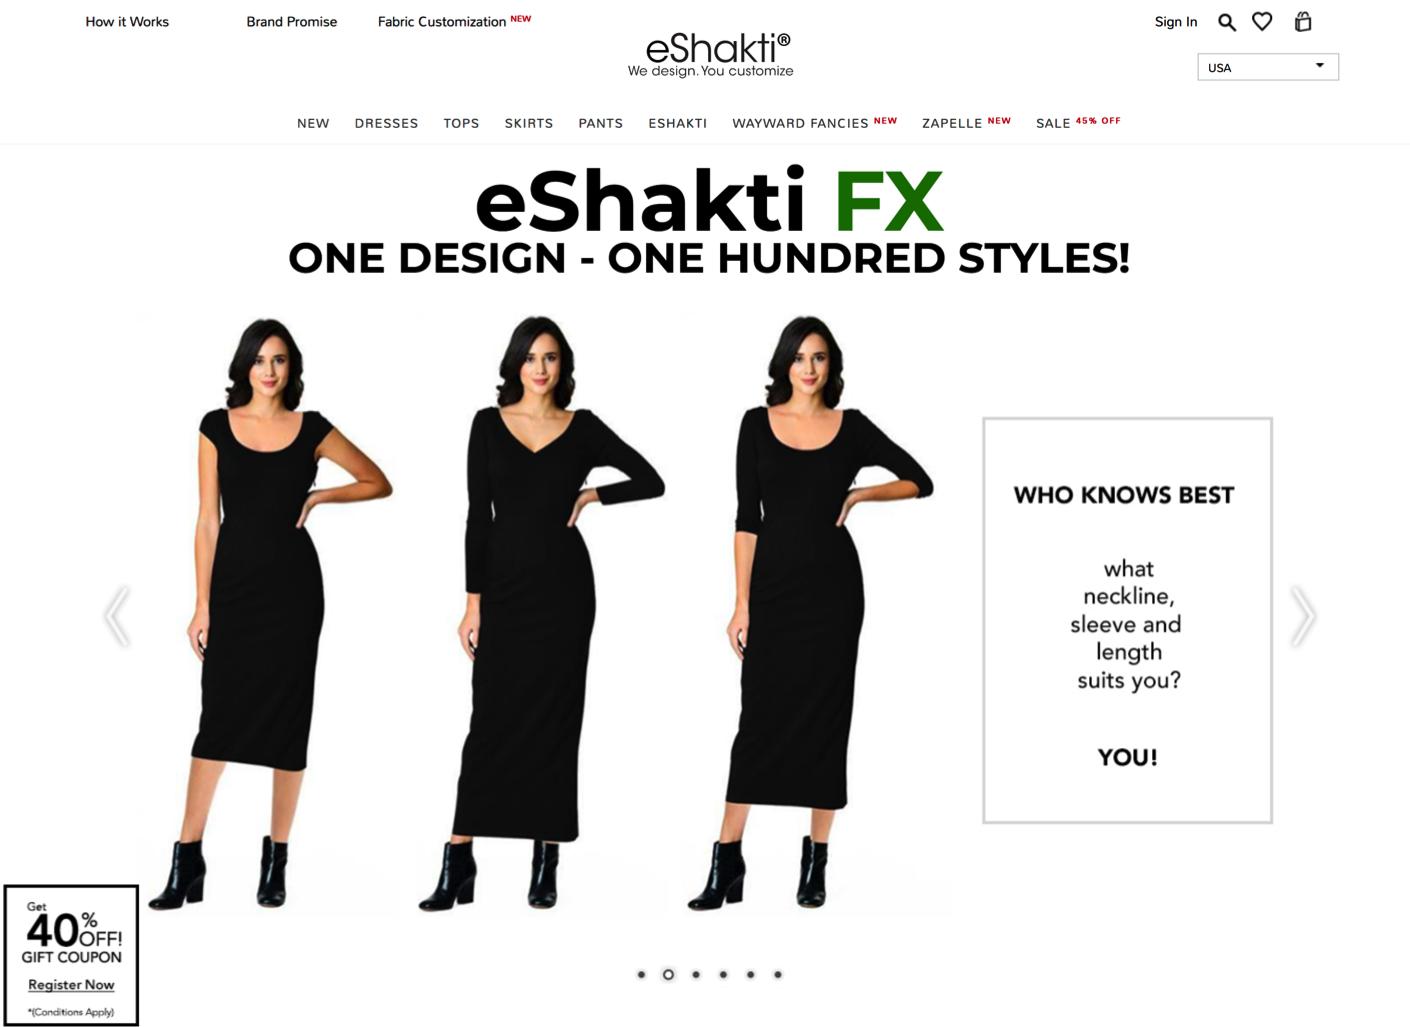 eShakti.com landing page - yoursassyself.com